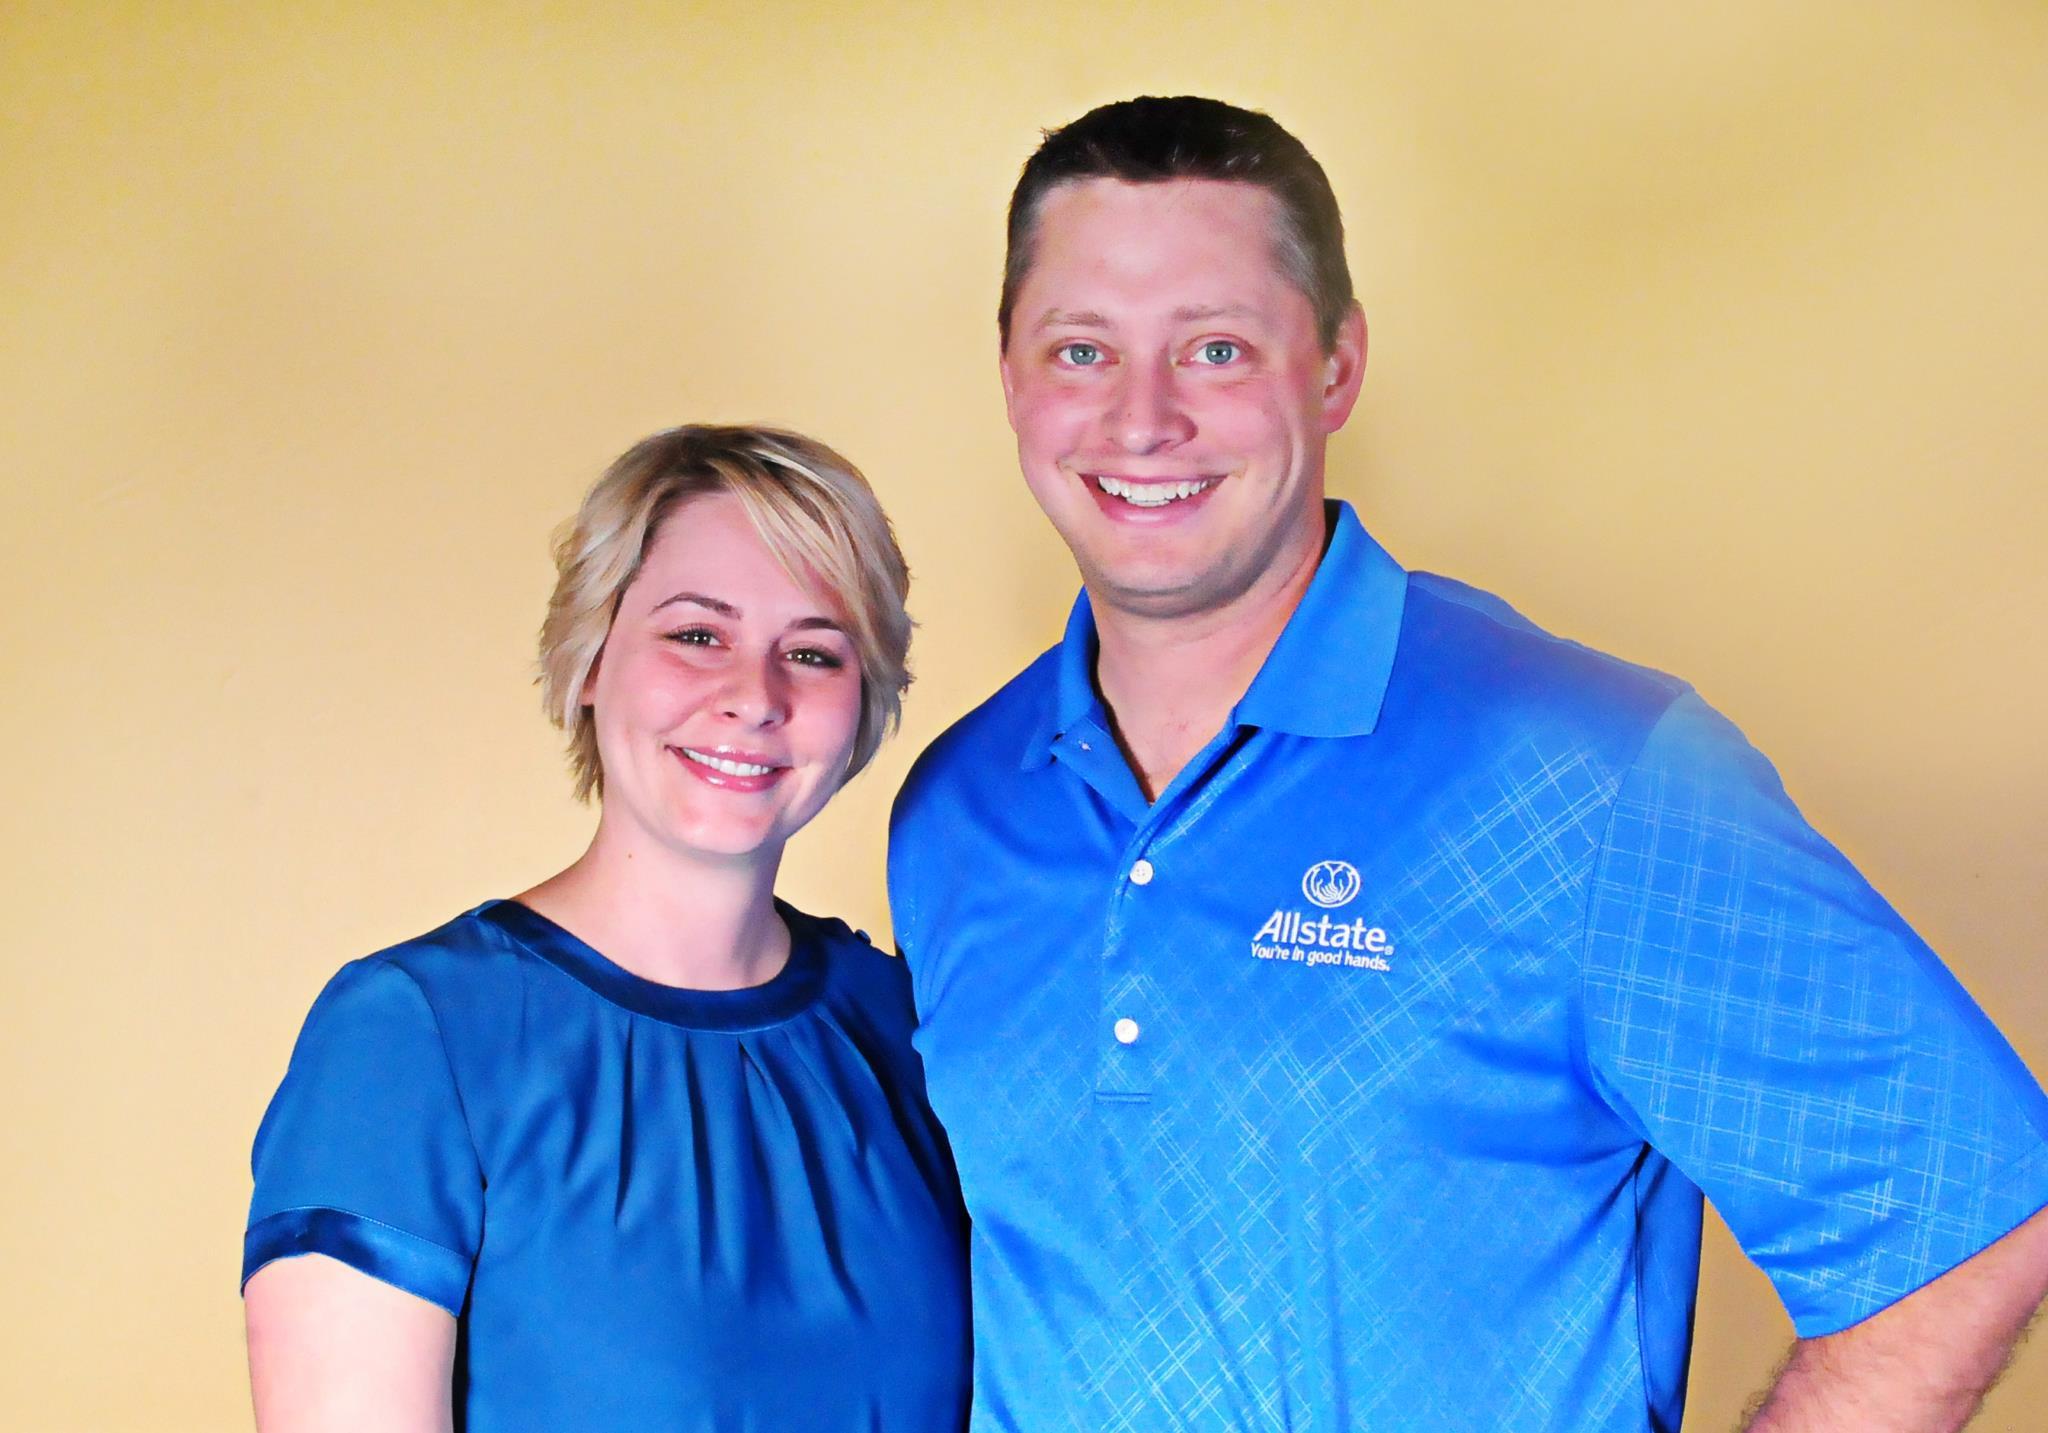 Brian Ralph: Allstate Insurance image 14